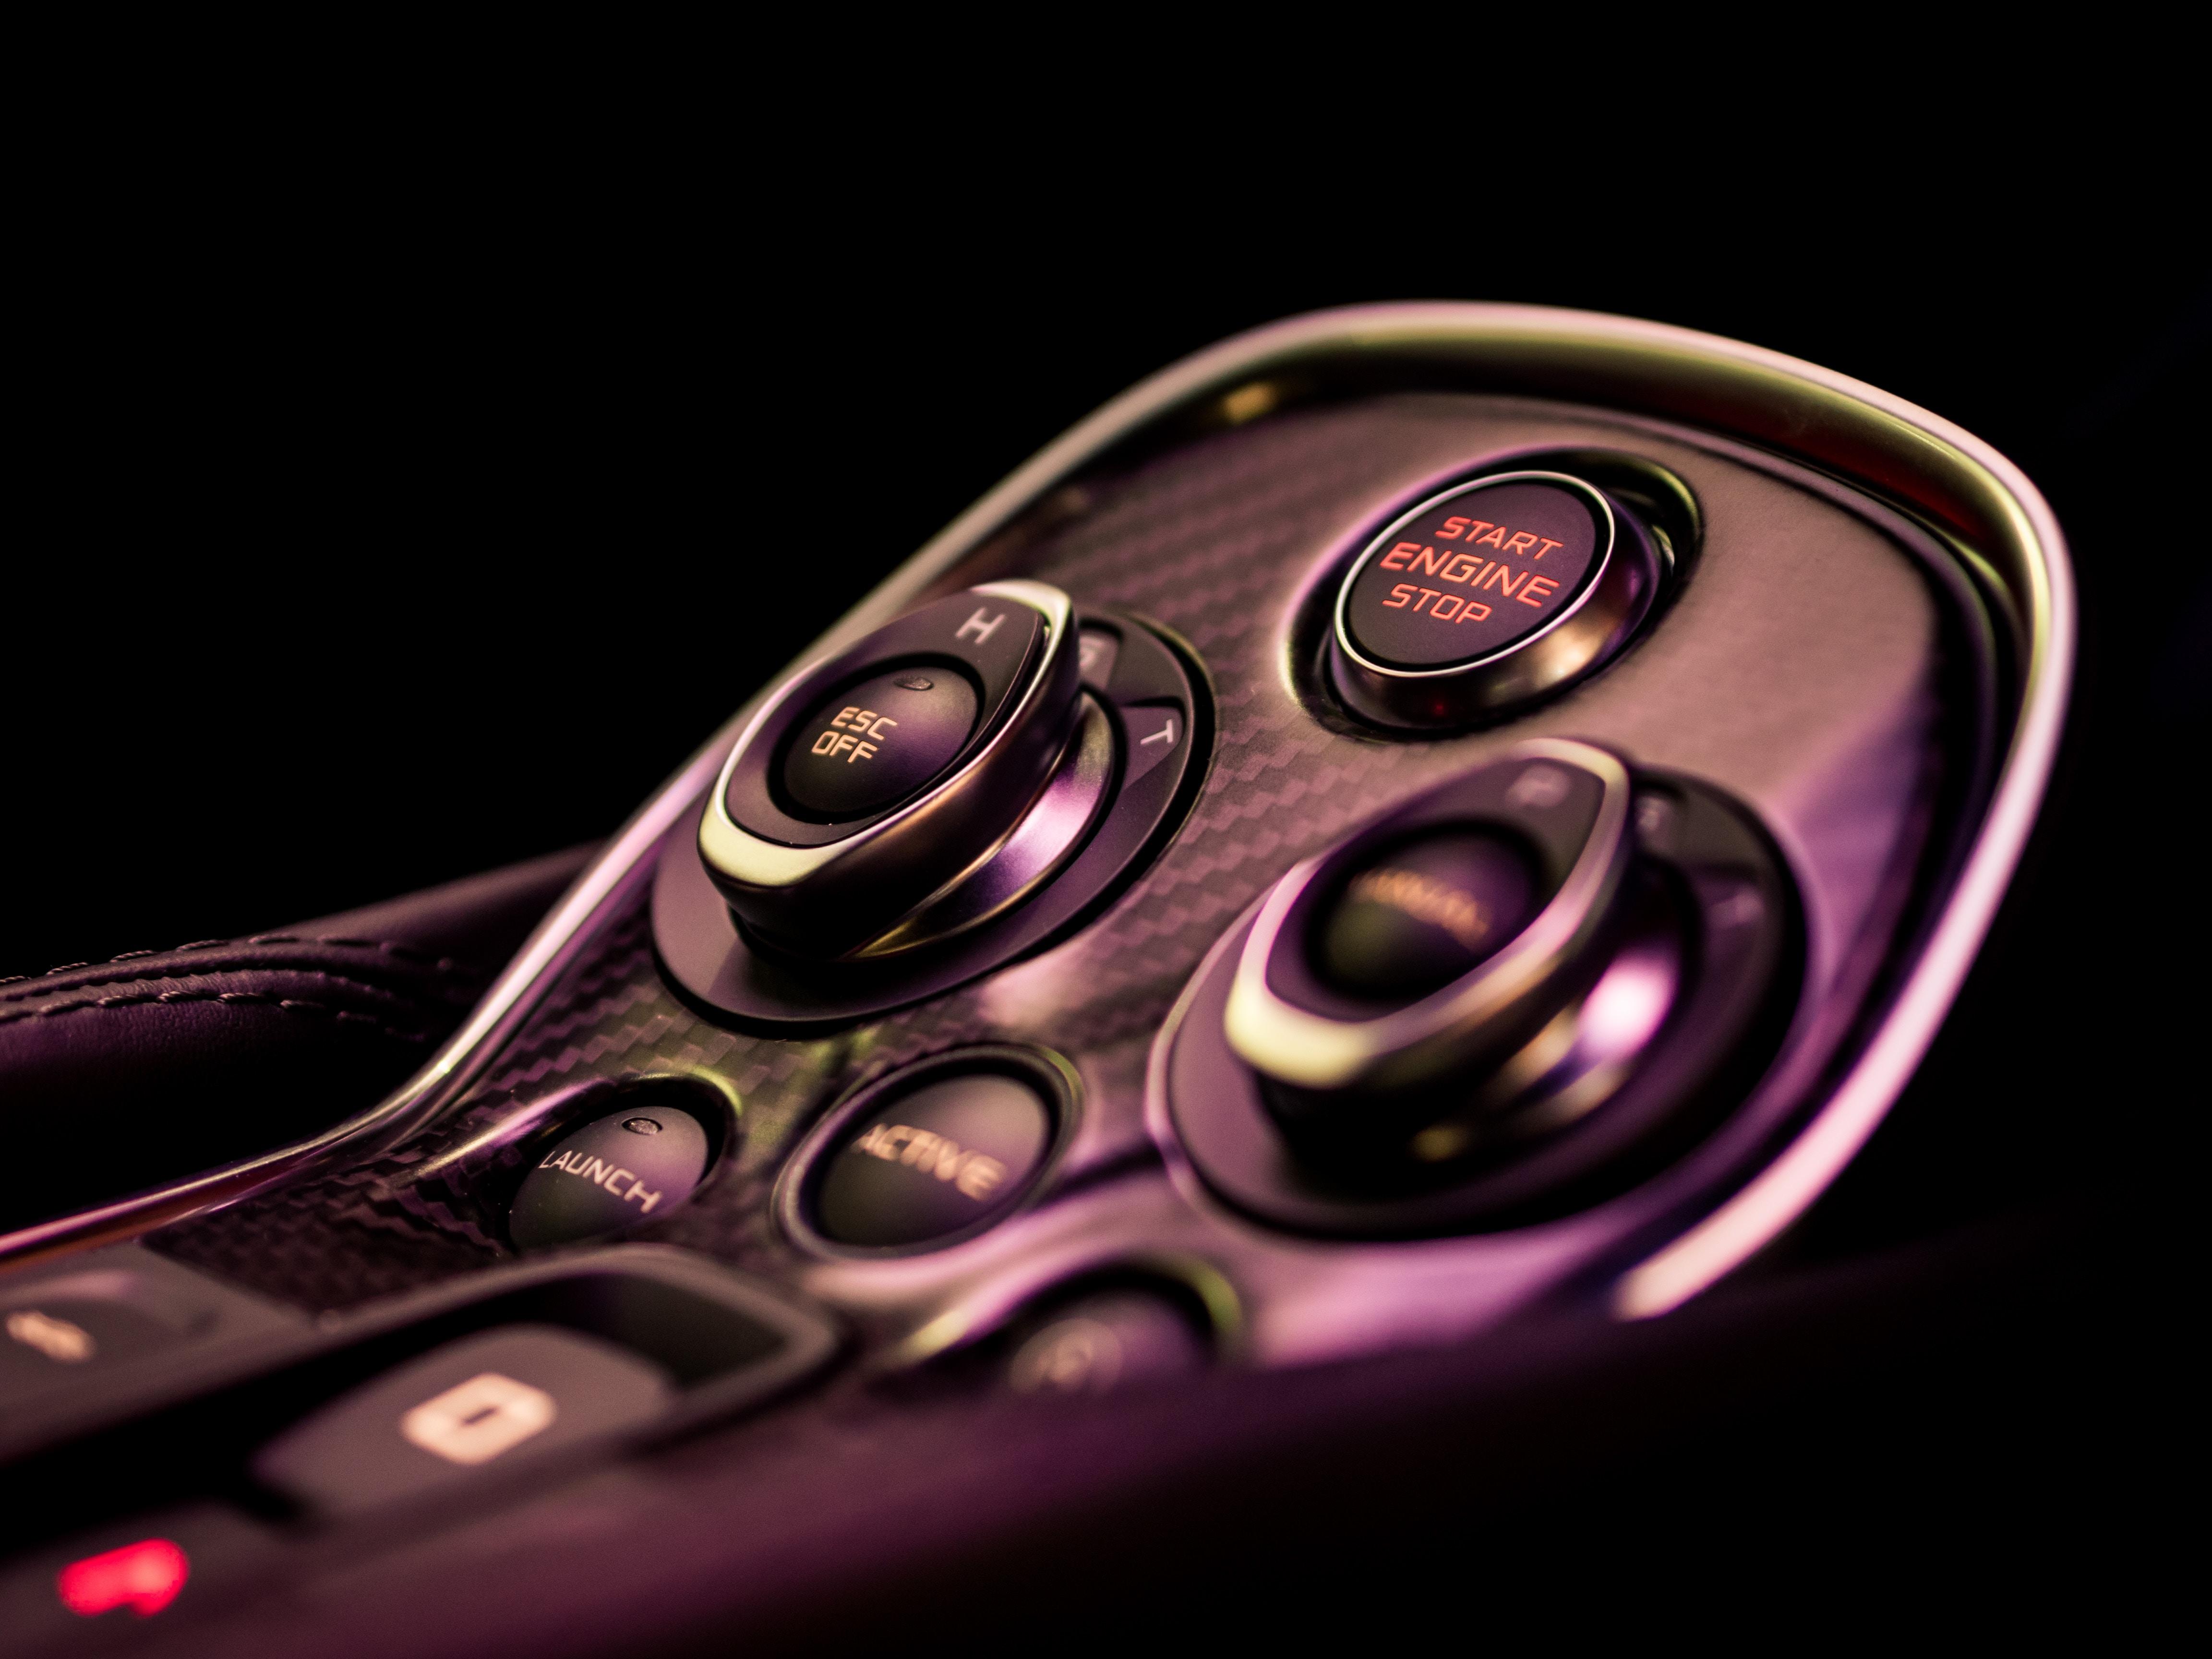 closeup photo of black remote control